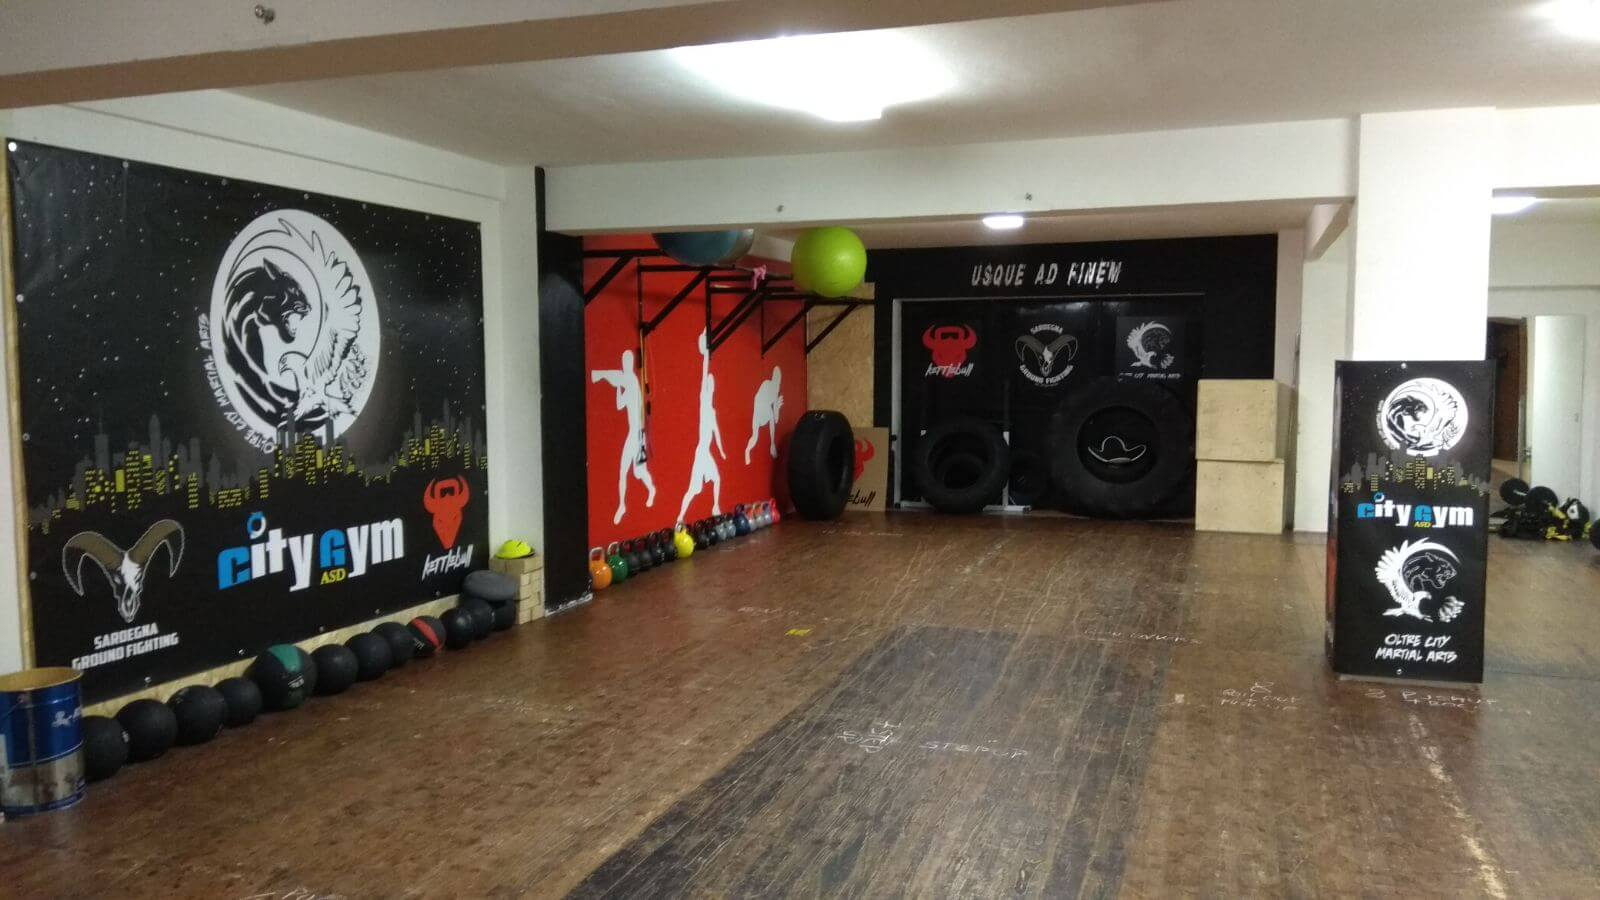 interni della palestra city gym